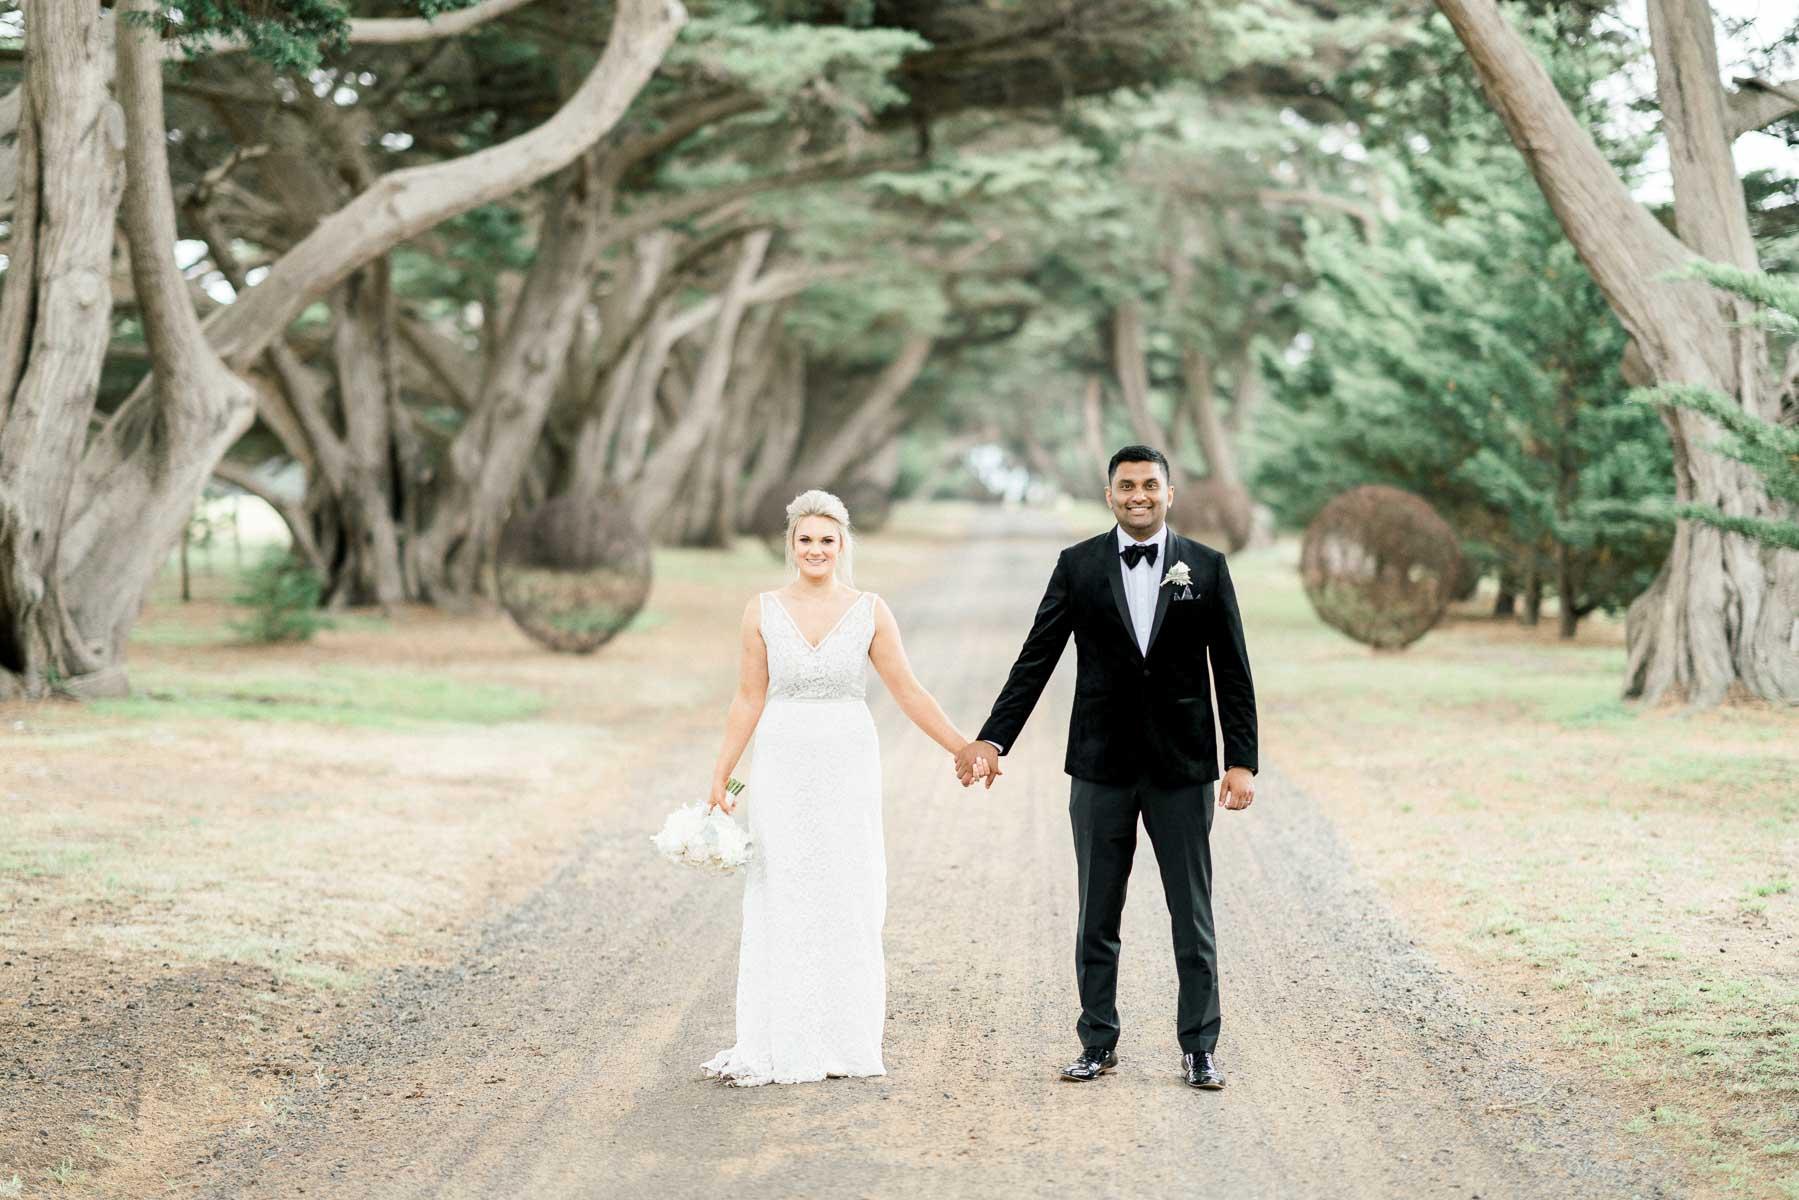 trenavin-chapel-phillip-island-wedding-heart+soul-weddings-sally-sean-01399.jpg